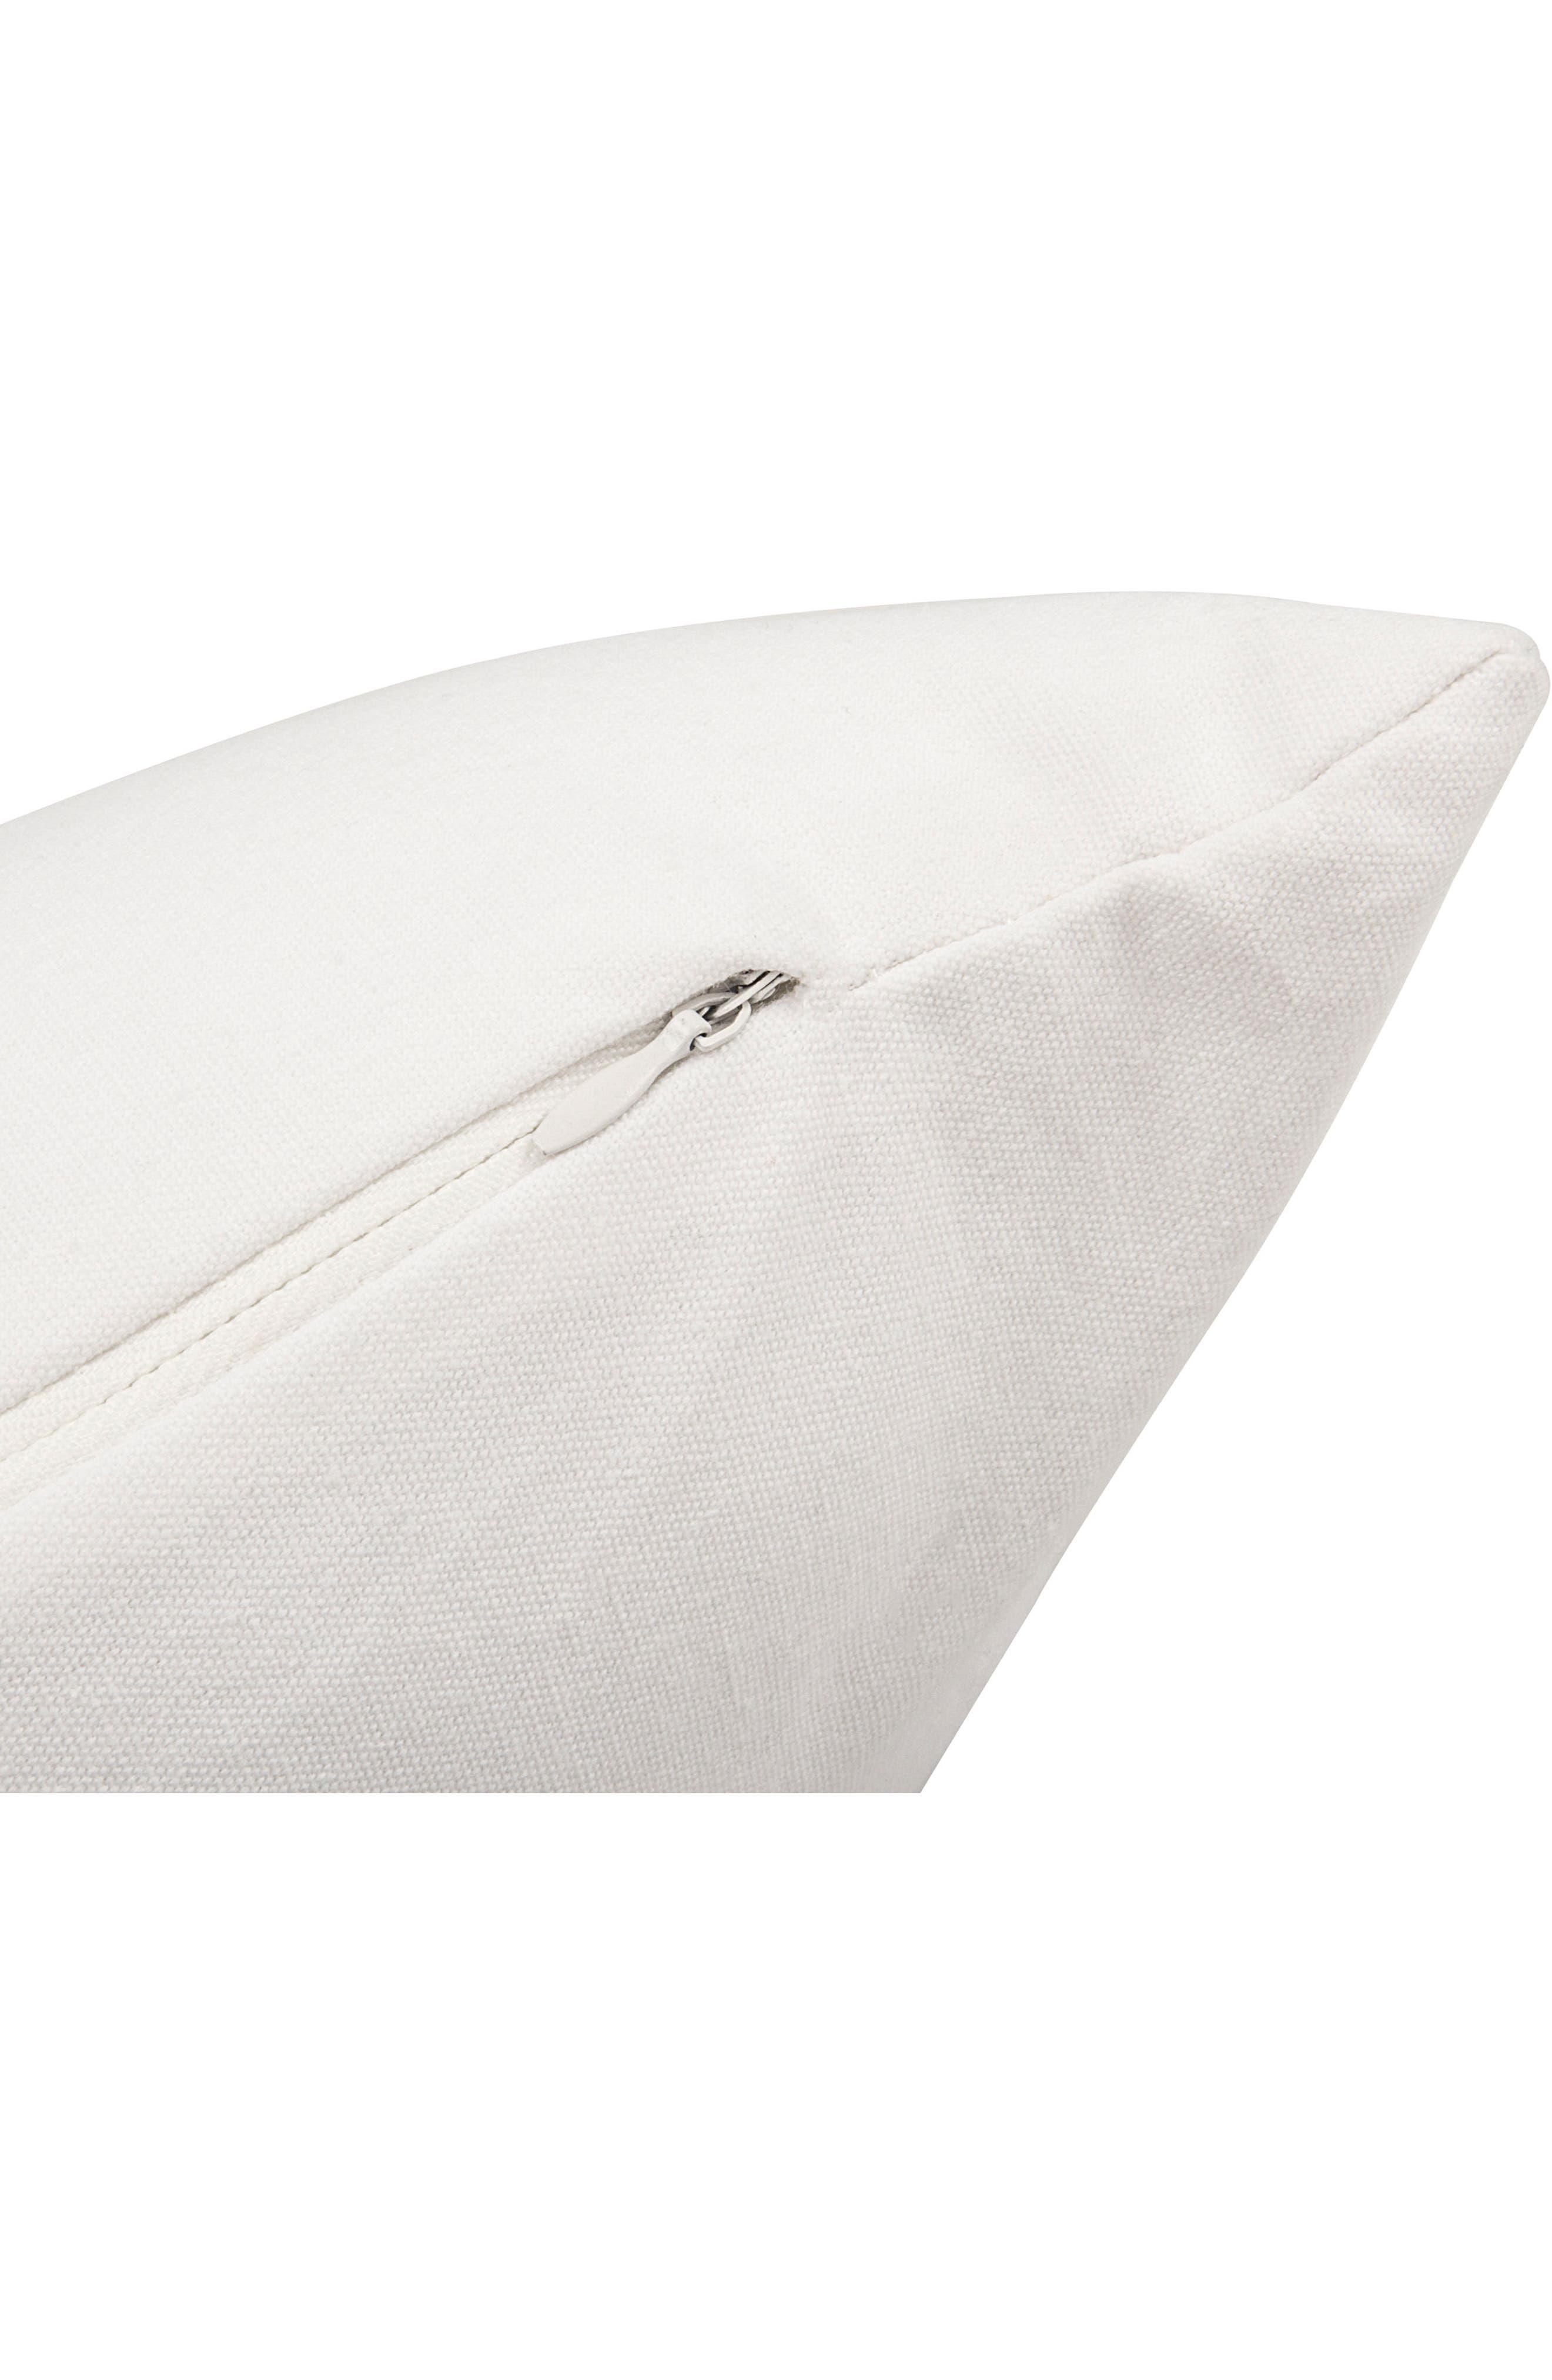 Palm Leaf Lumbar Accent Pillow,                             Alternate thumbnail 3, color,                             300